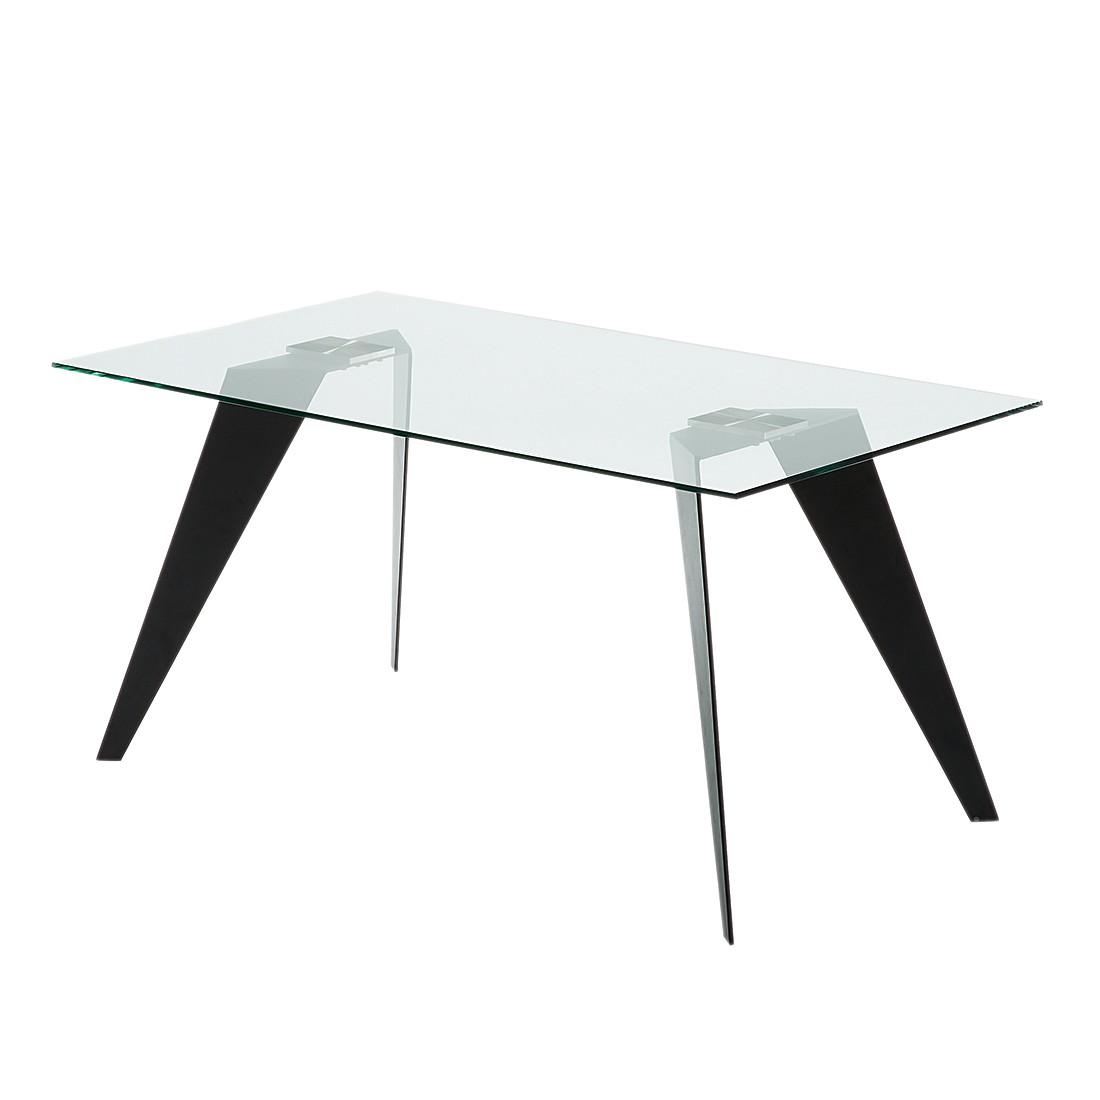 Eettafel Anath - glas/zwart roestvrij staal - 160x90cm, roomscape